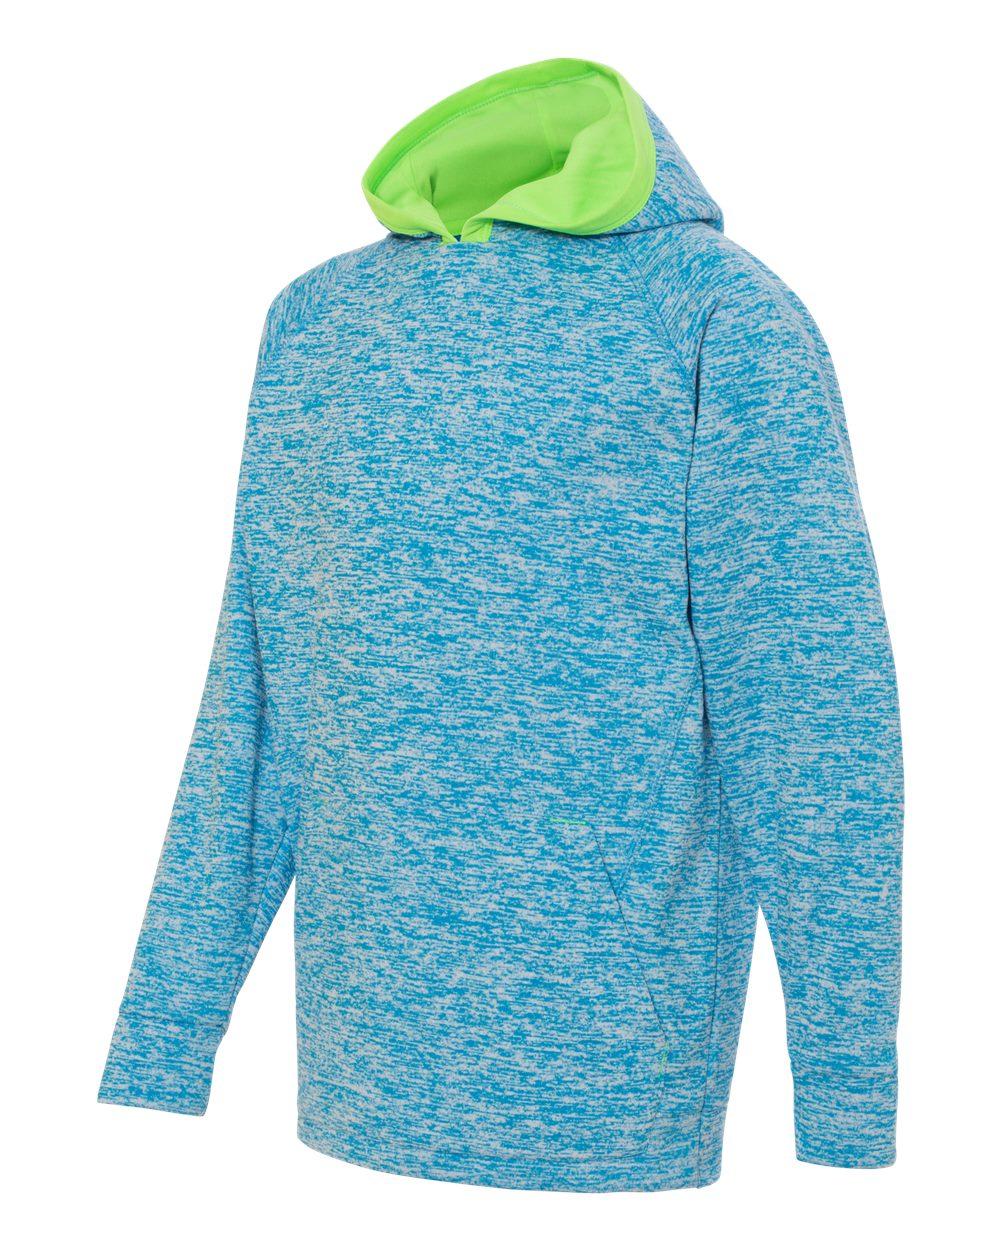 J. America 8610 - Youth Cosmic Fleece Hooded Pullover Sweatshirt